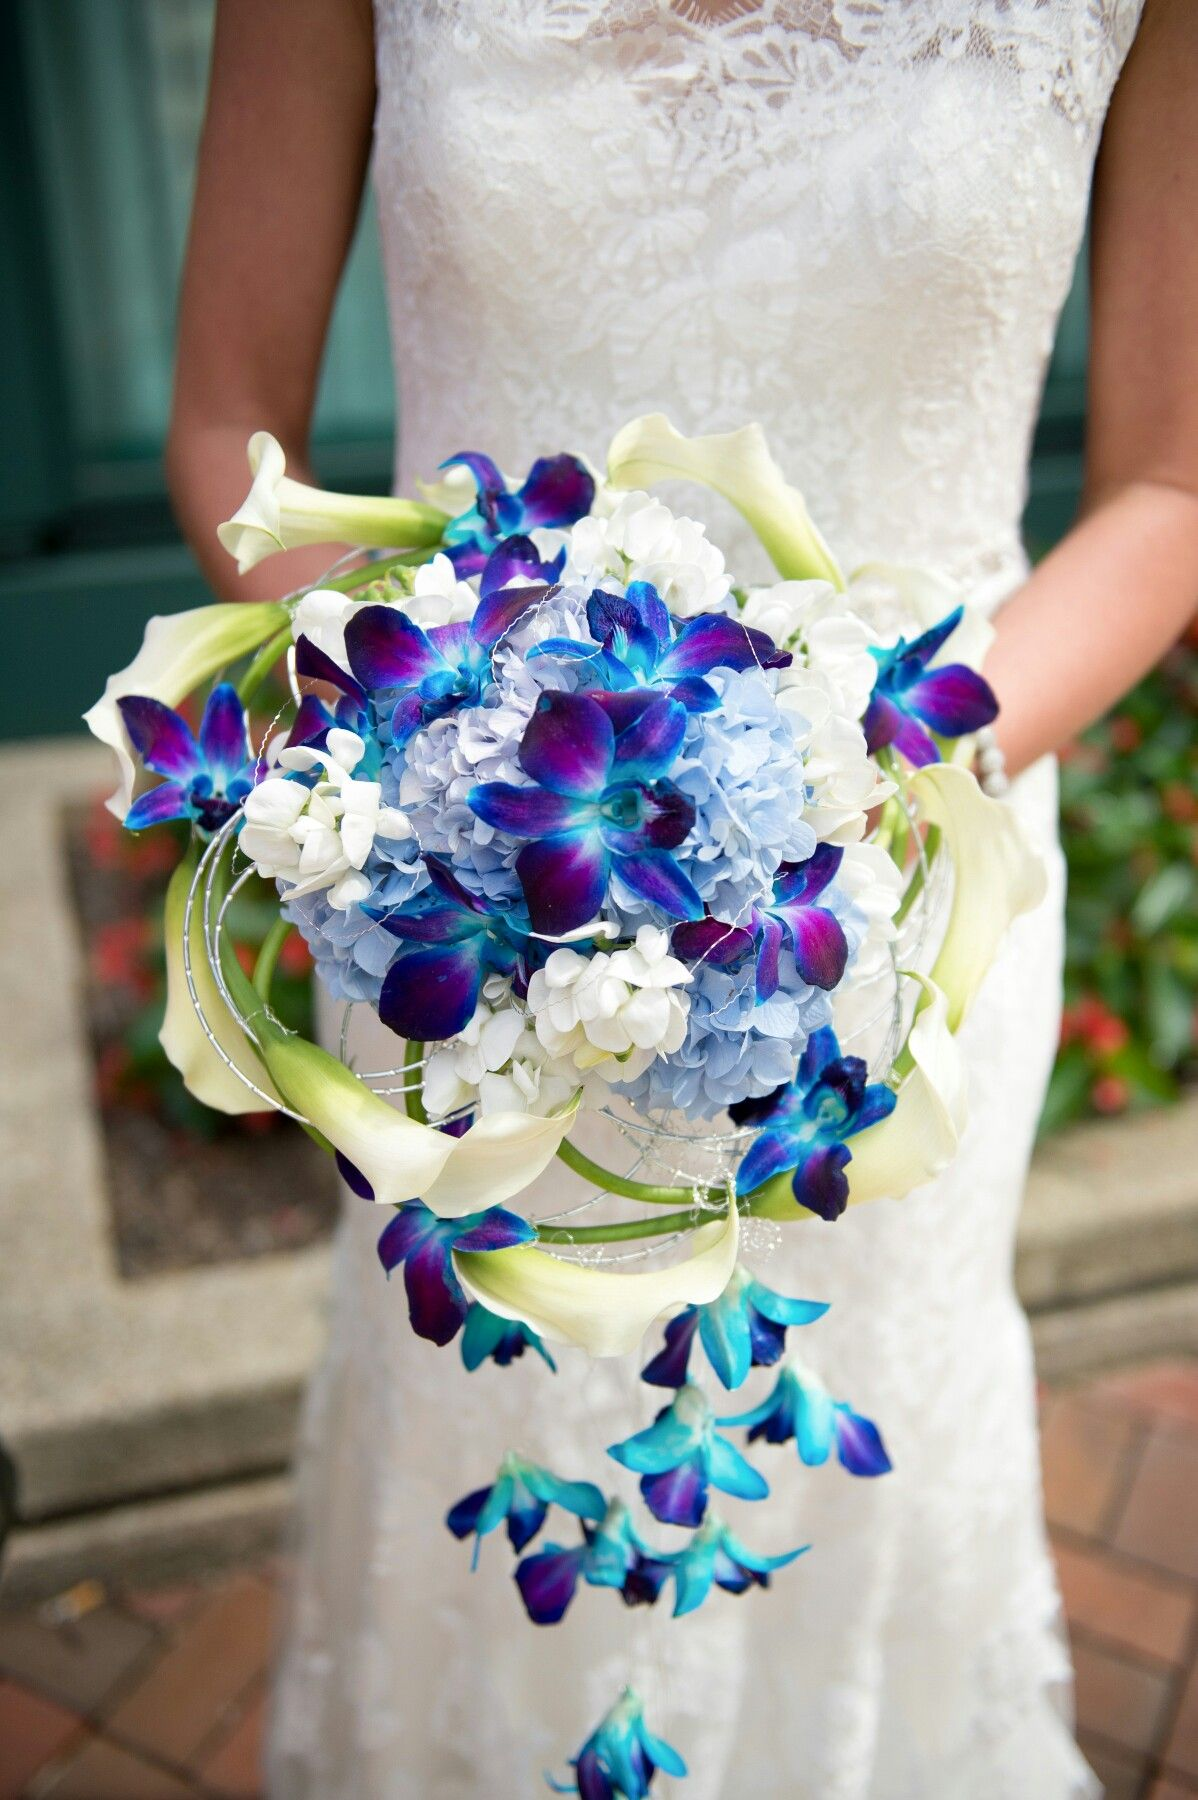 Abloom, Ltd. Bride Blue Orchids & Calla Lilies Modern